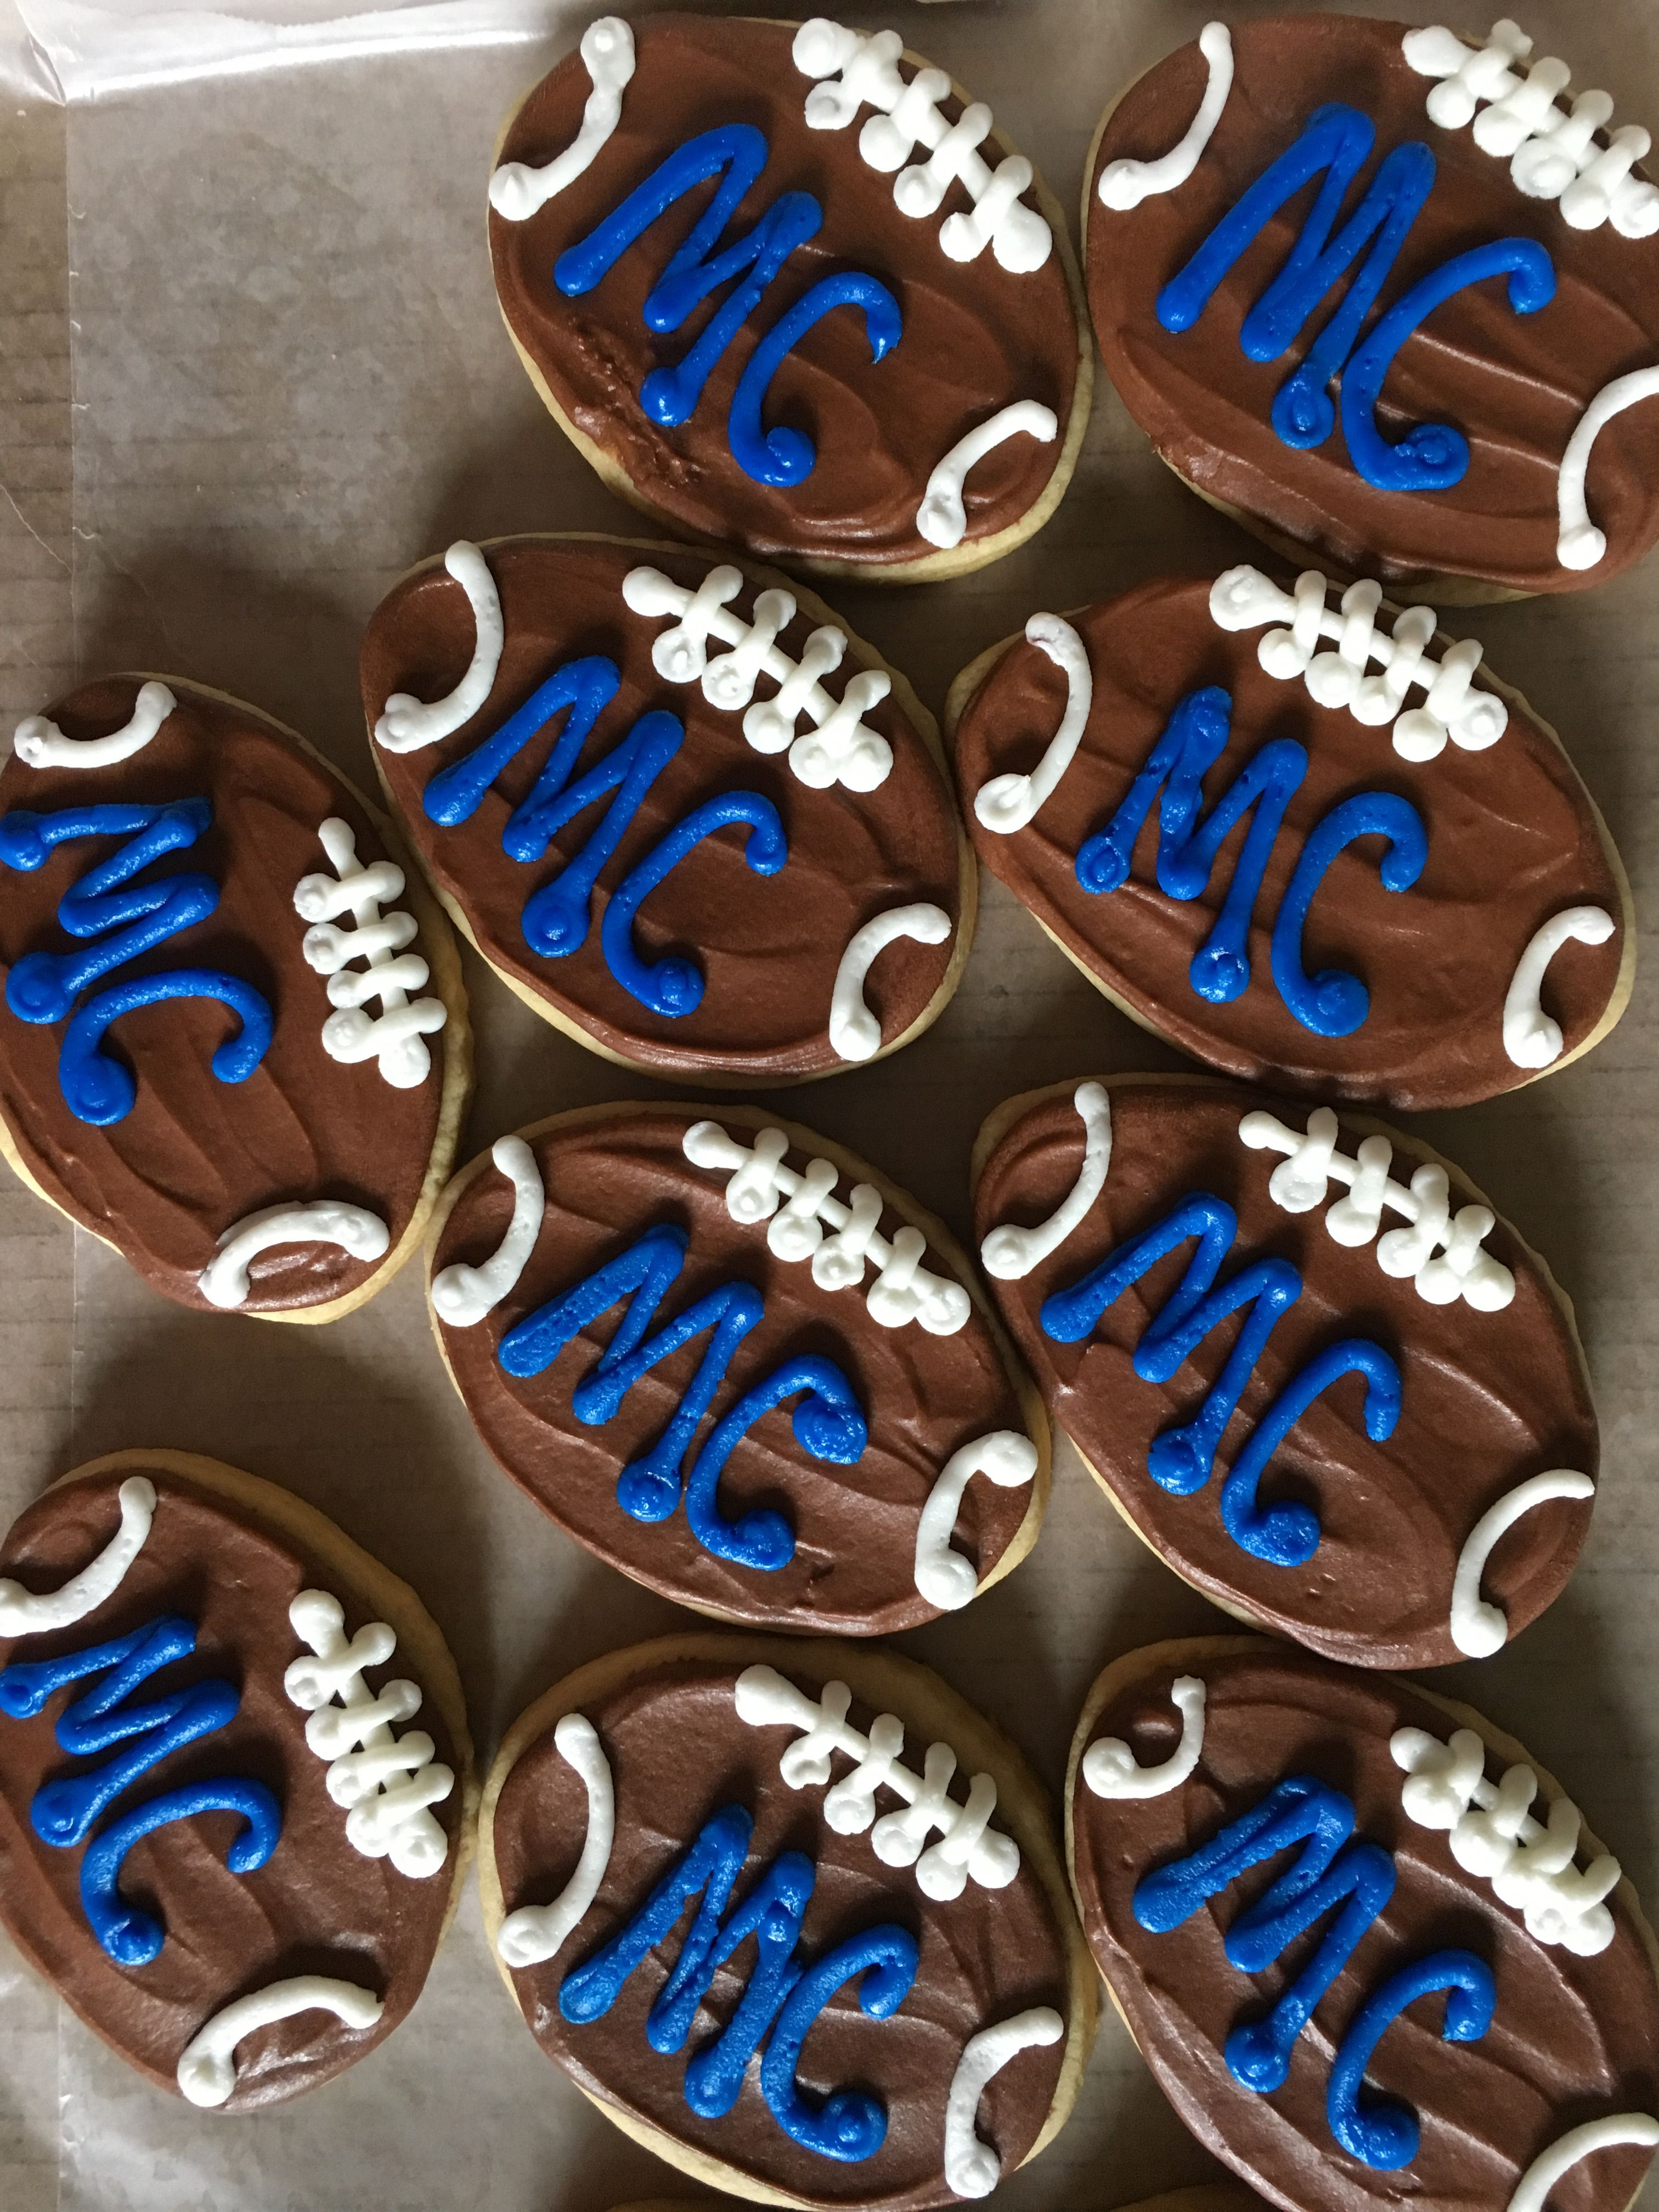 Marietta College football cookies | Football cookies ...